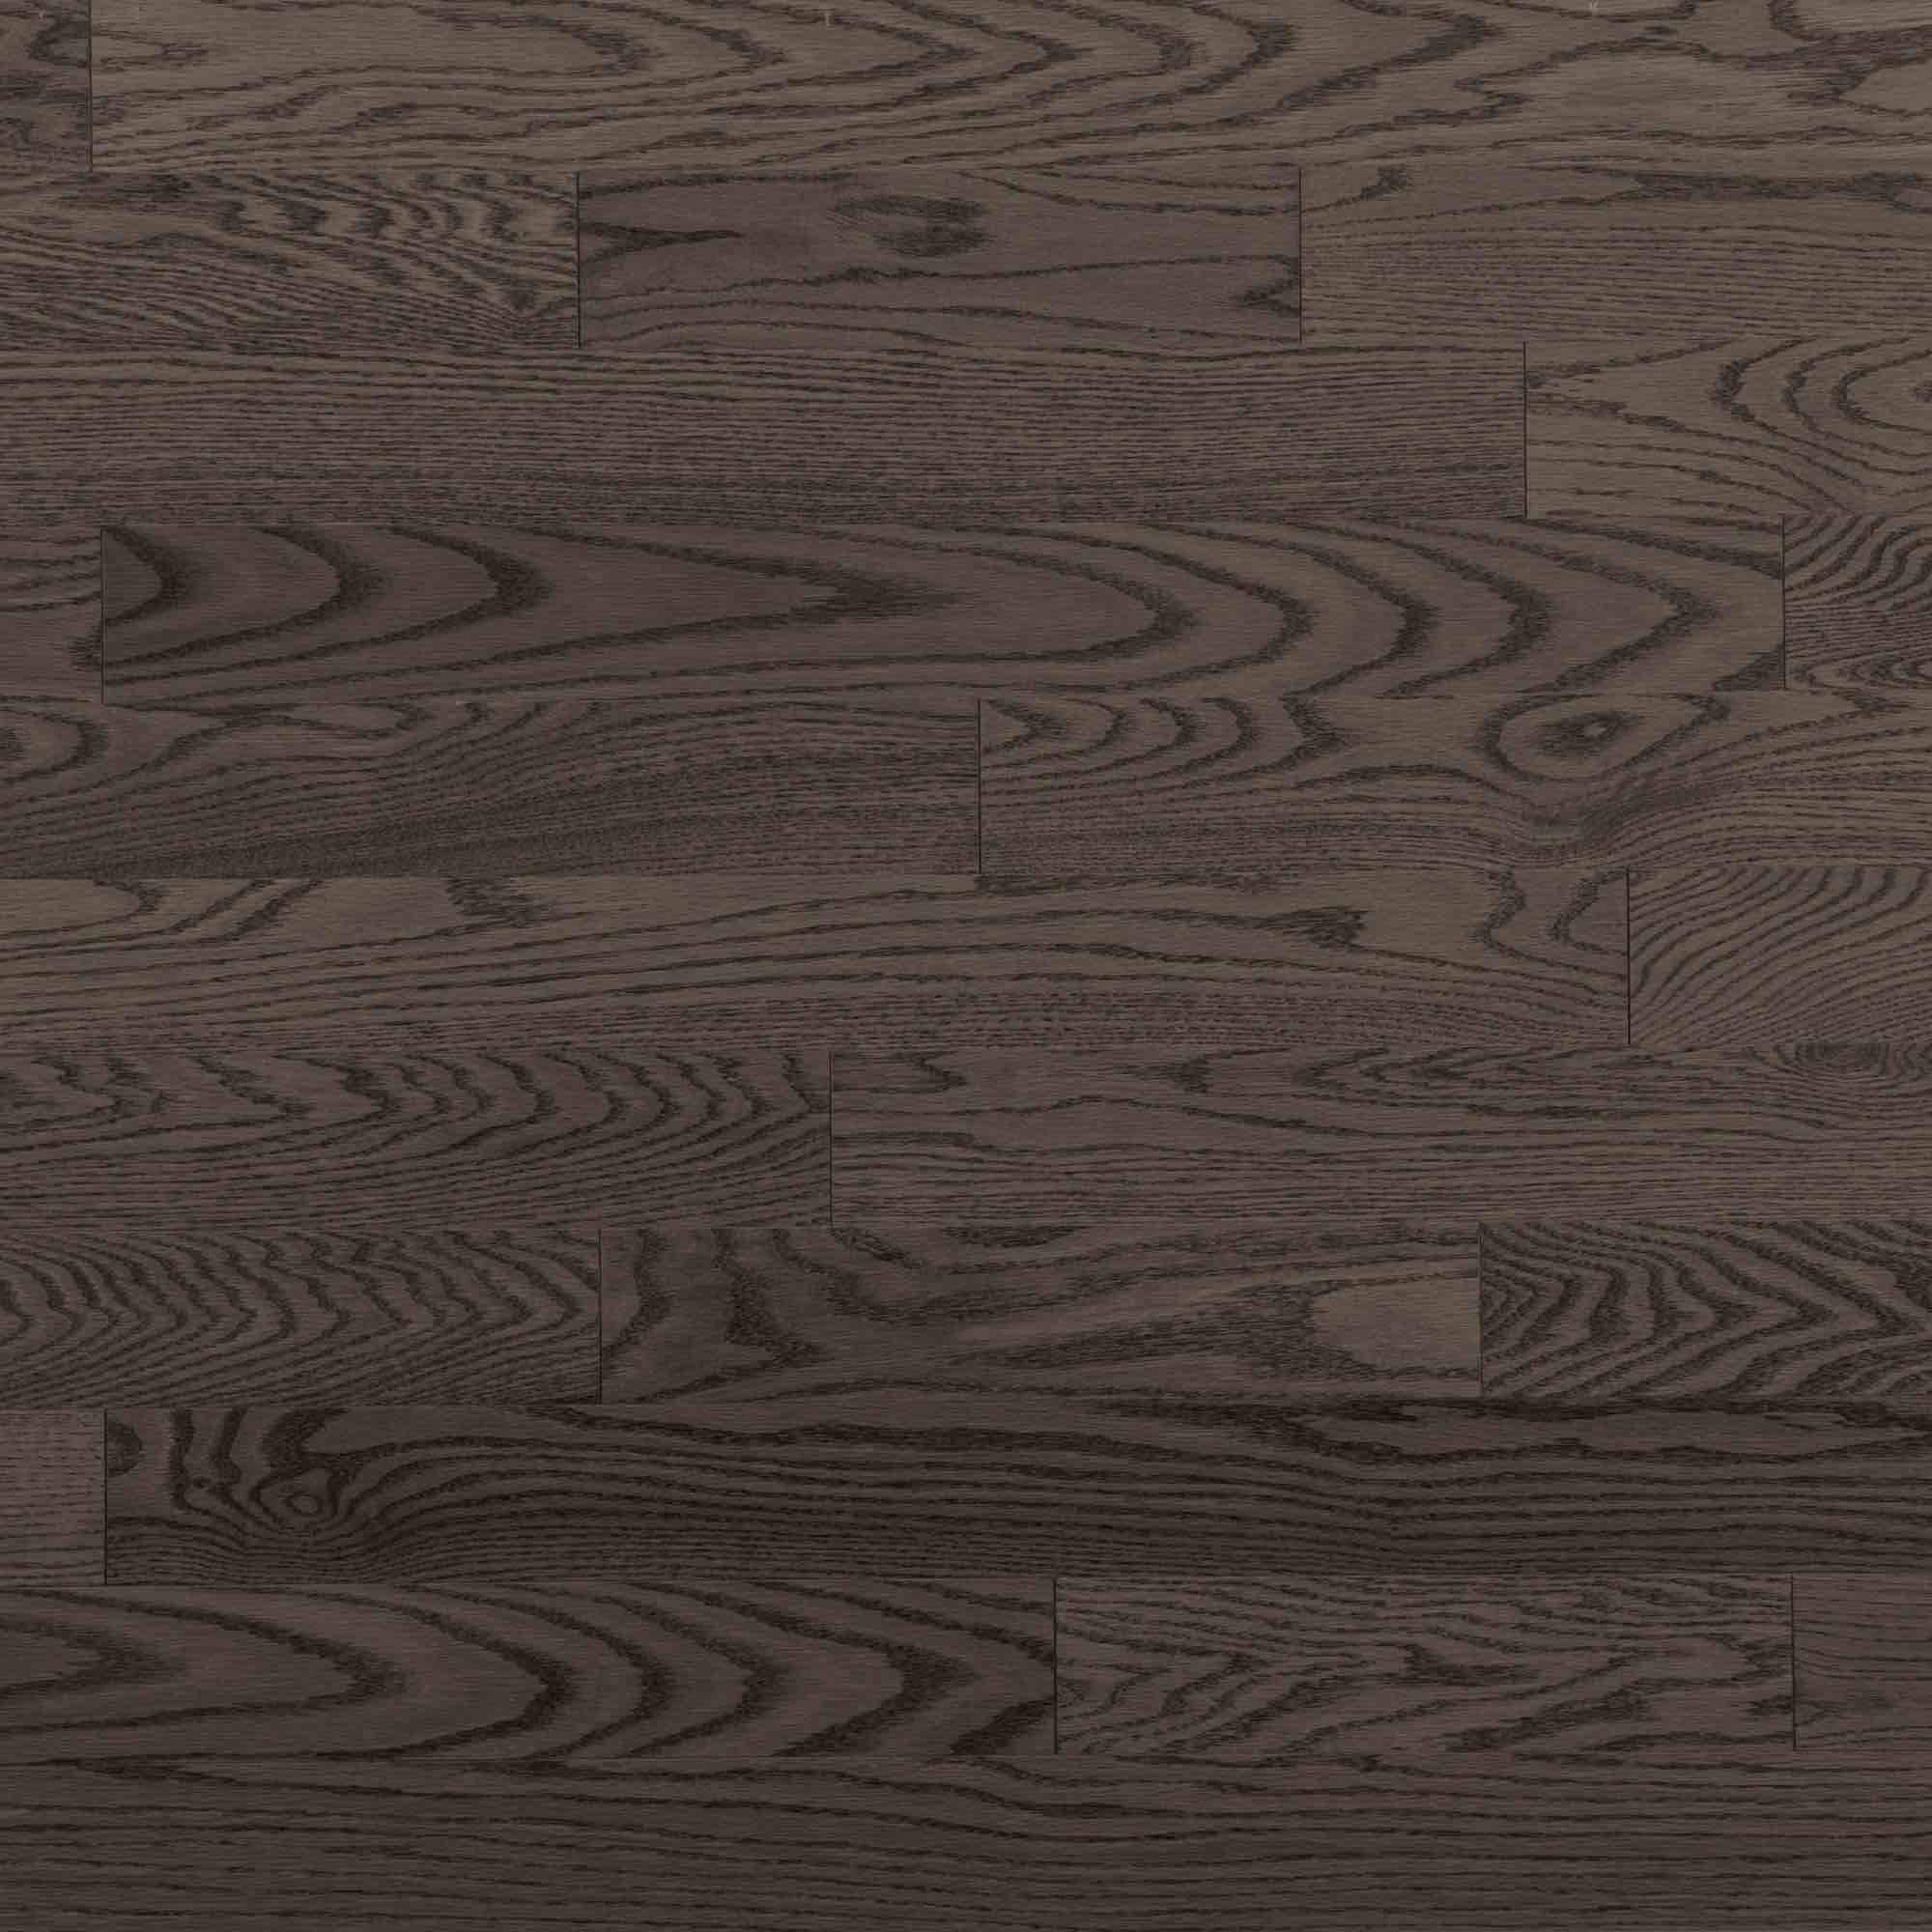 grey hardwood floors modern of hardwood westfloors west vancouver hardwood flooring carpet regarding featured hardwoods red oak charcoal